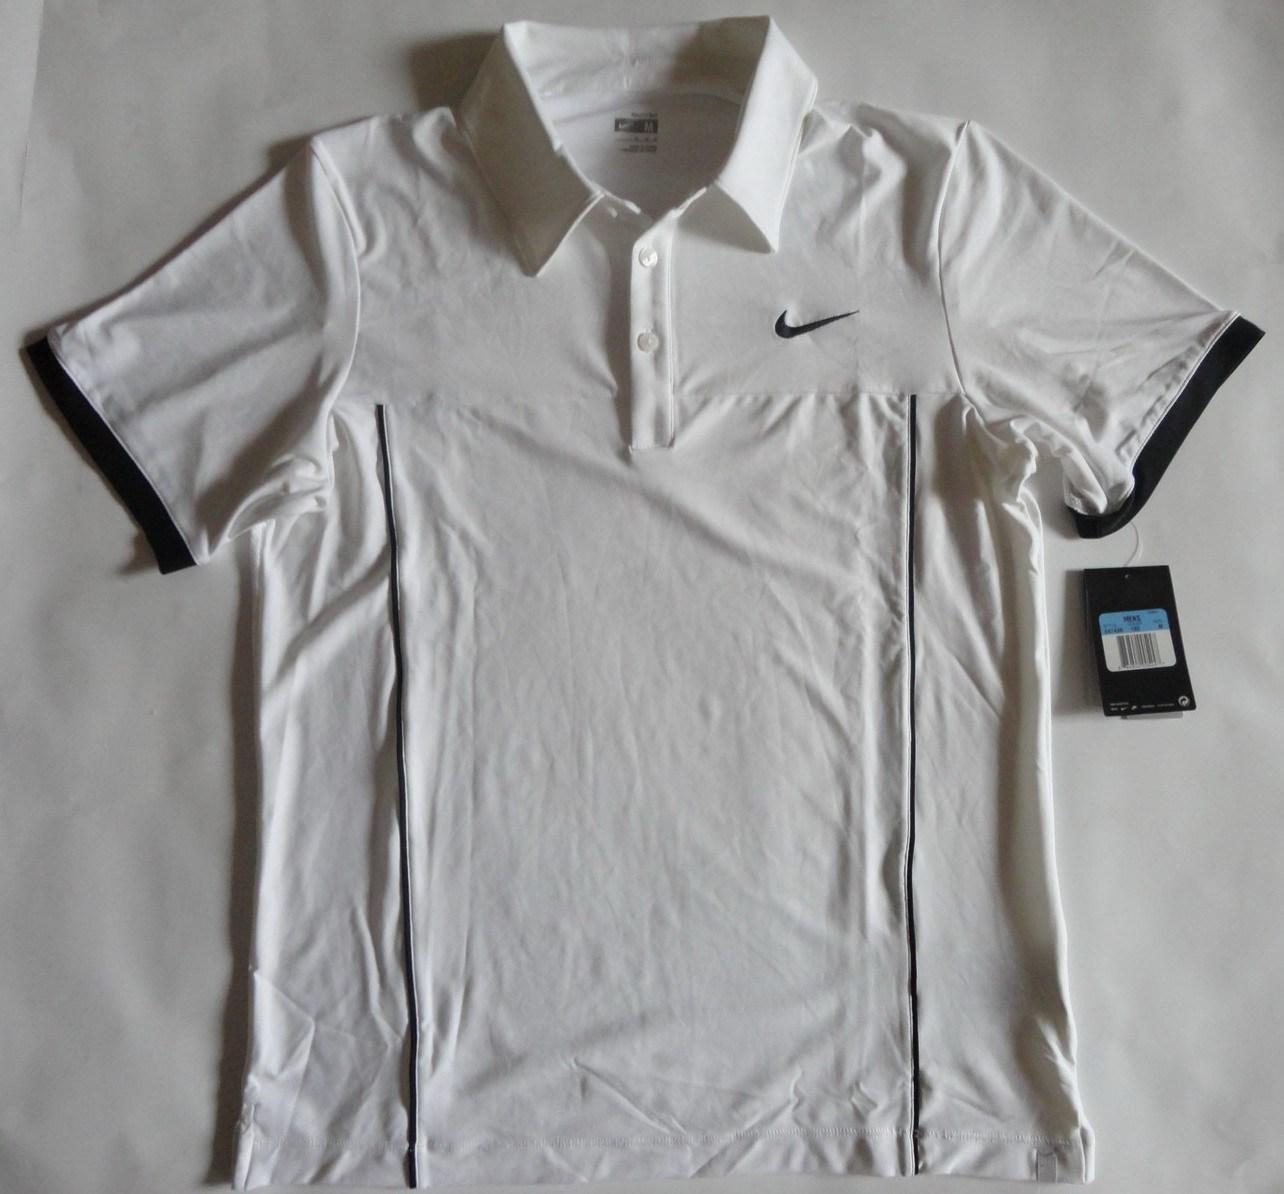 Спортивная футболка Nike 347438/100 TENNIS 347438